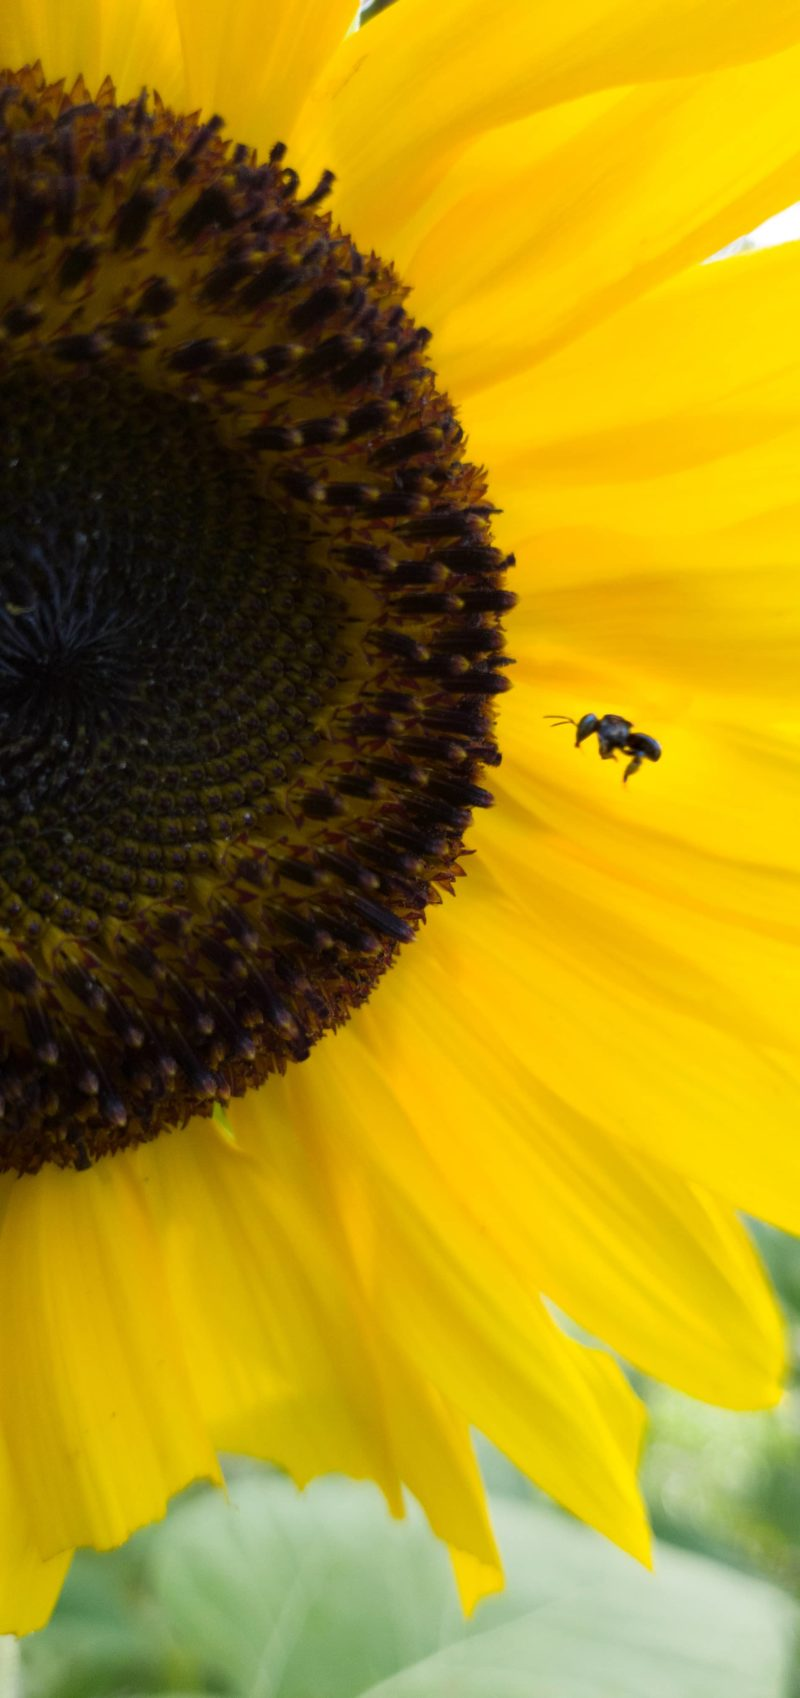 Boca-de-Sapo pollinating Sunflower